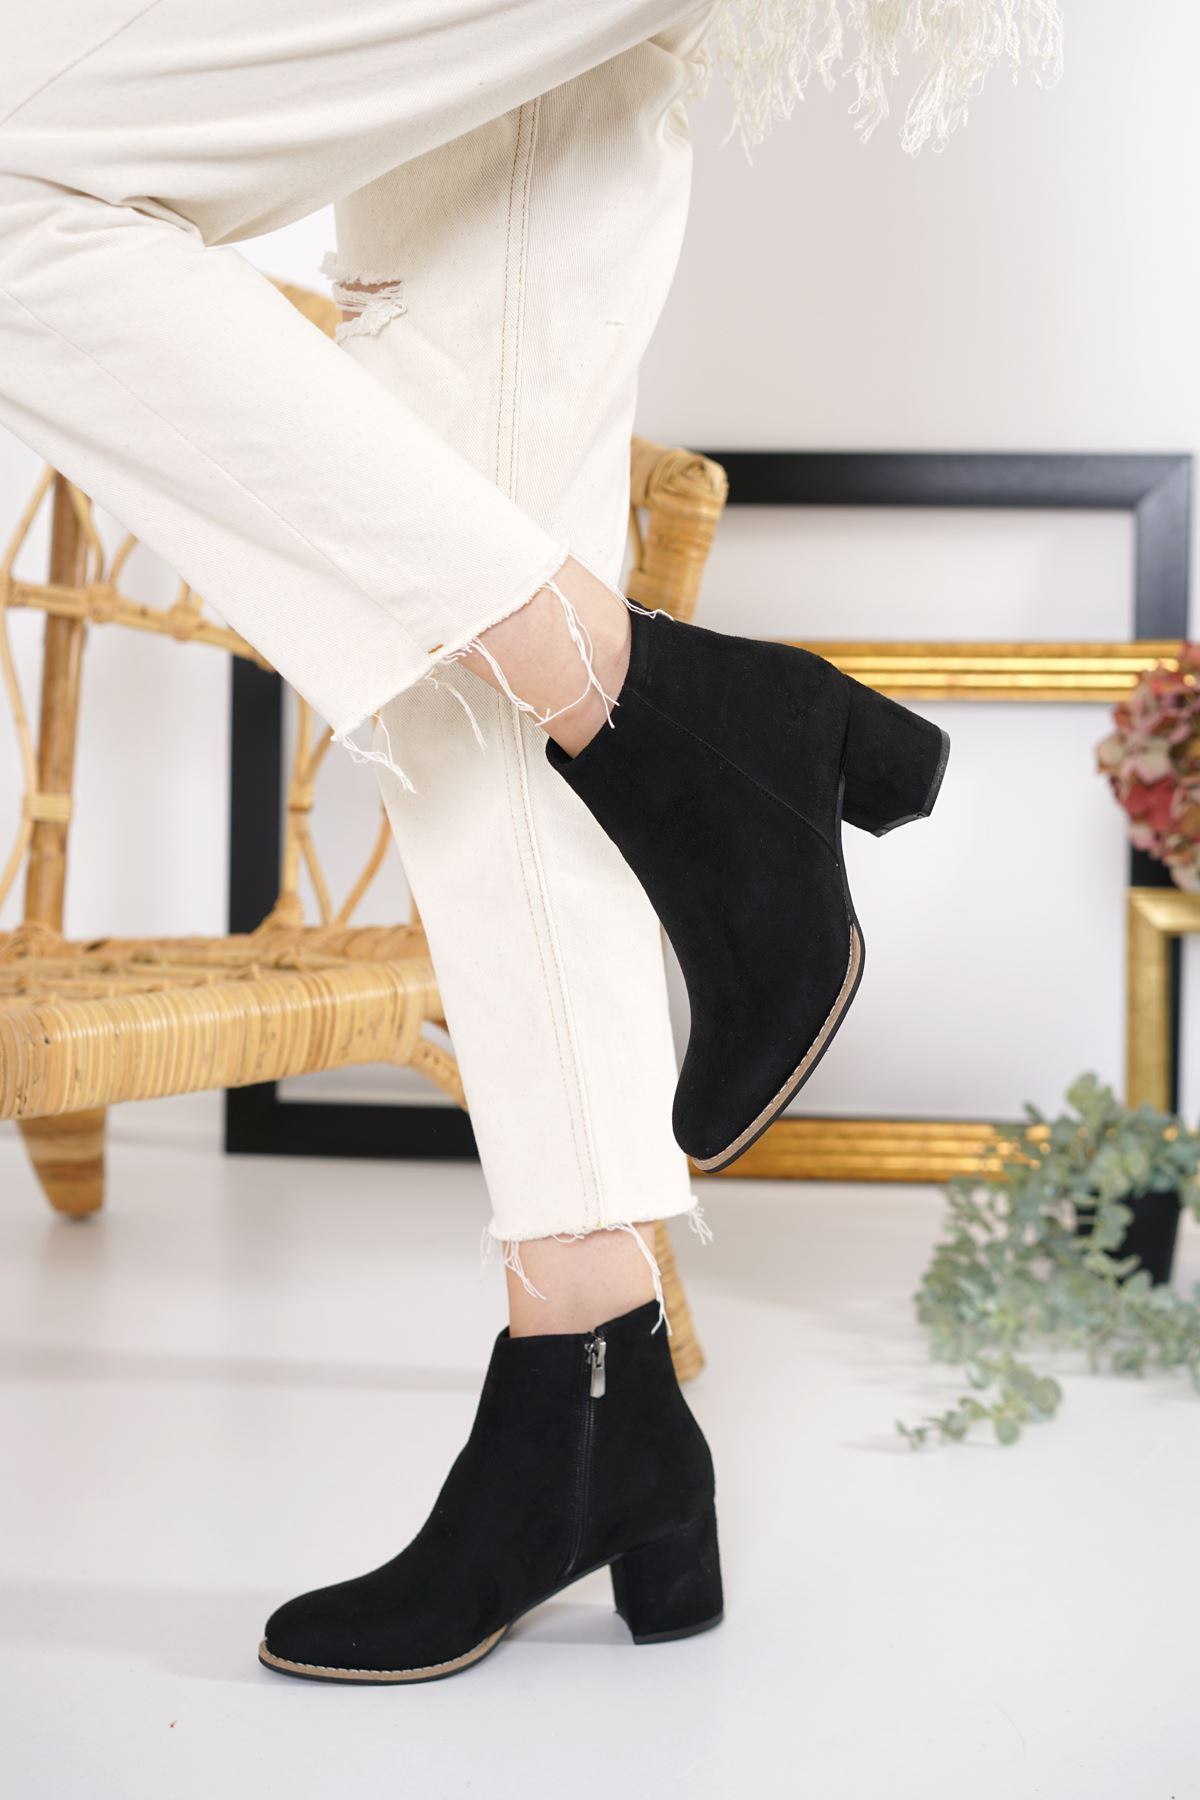 Vero Siyah Süet Topuklu Kadın Bot